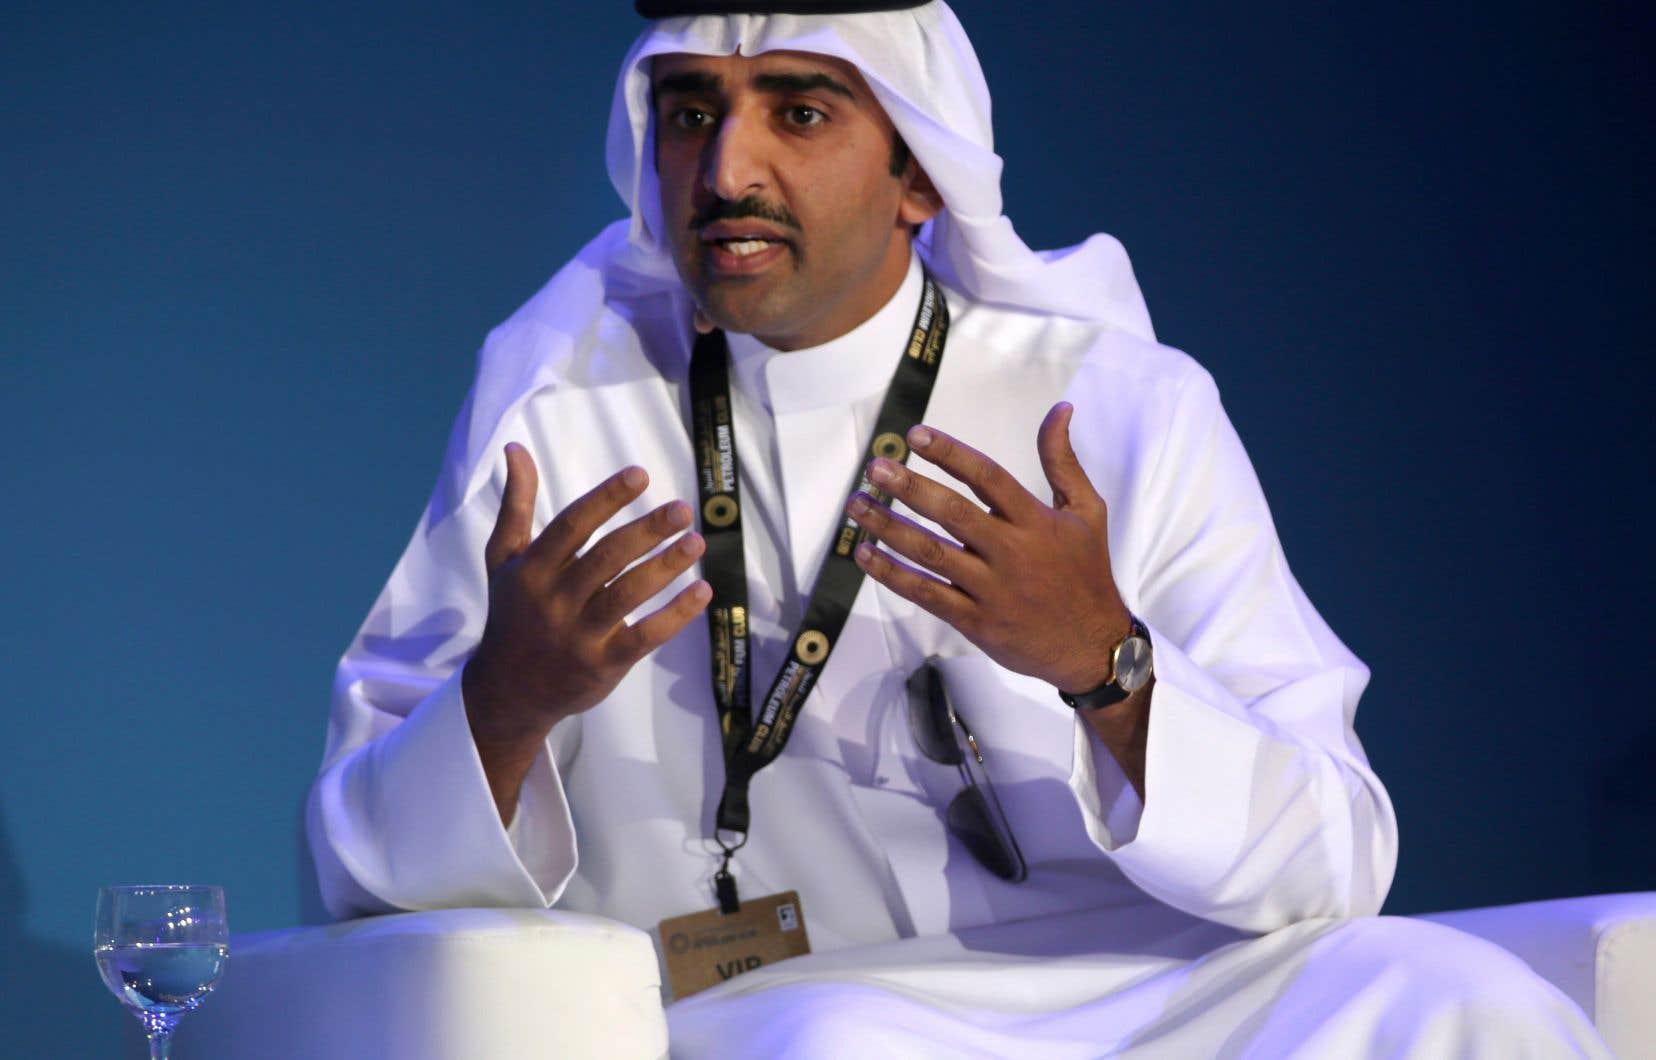 Le cheikh Mohammed ben Khalifa al-Khalifa